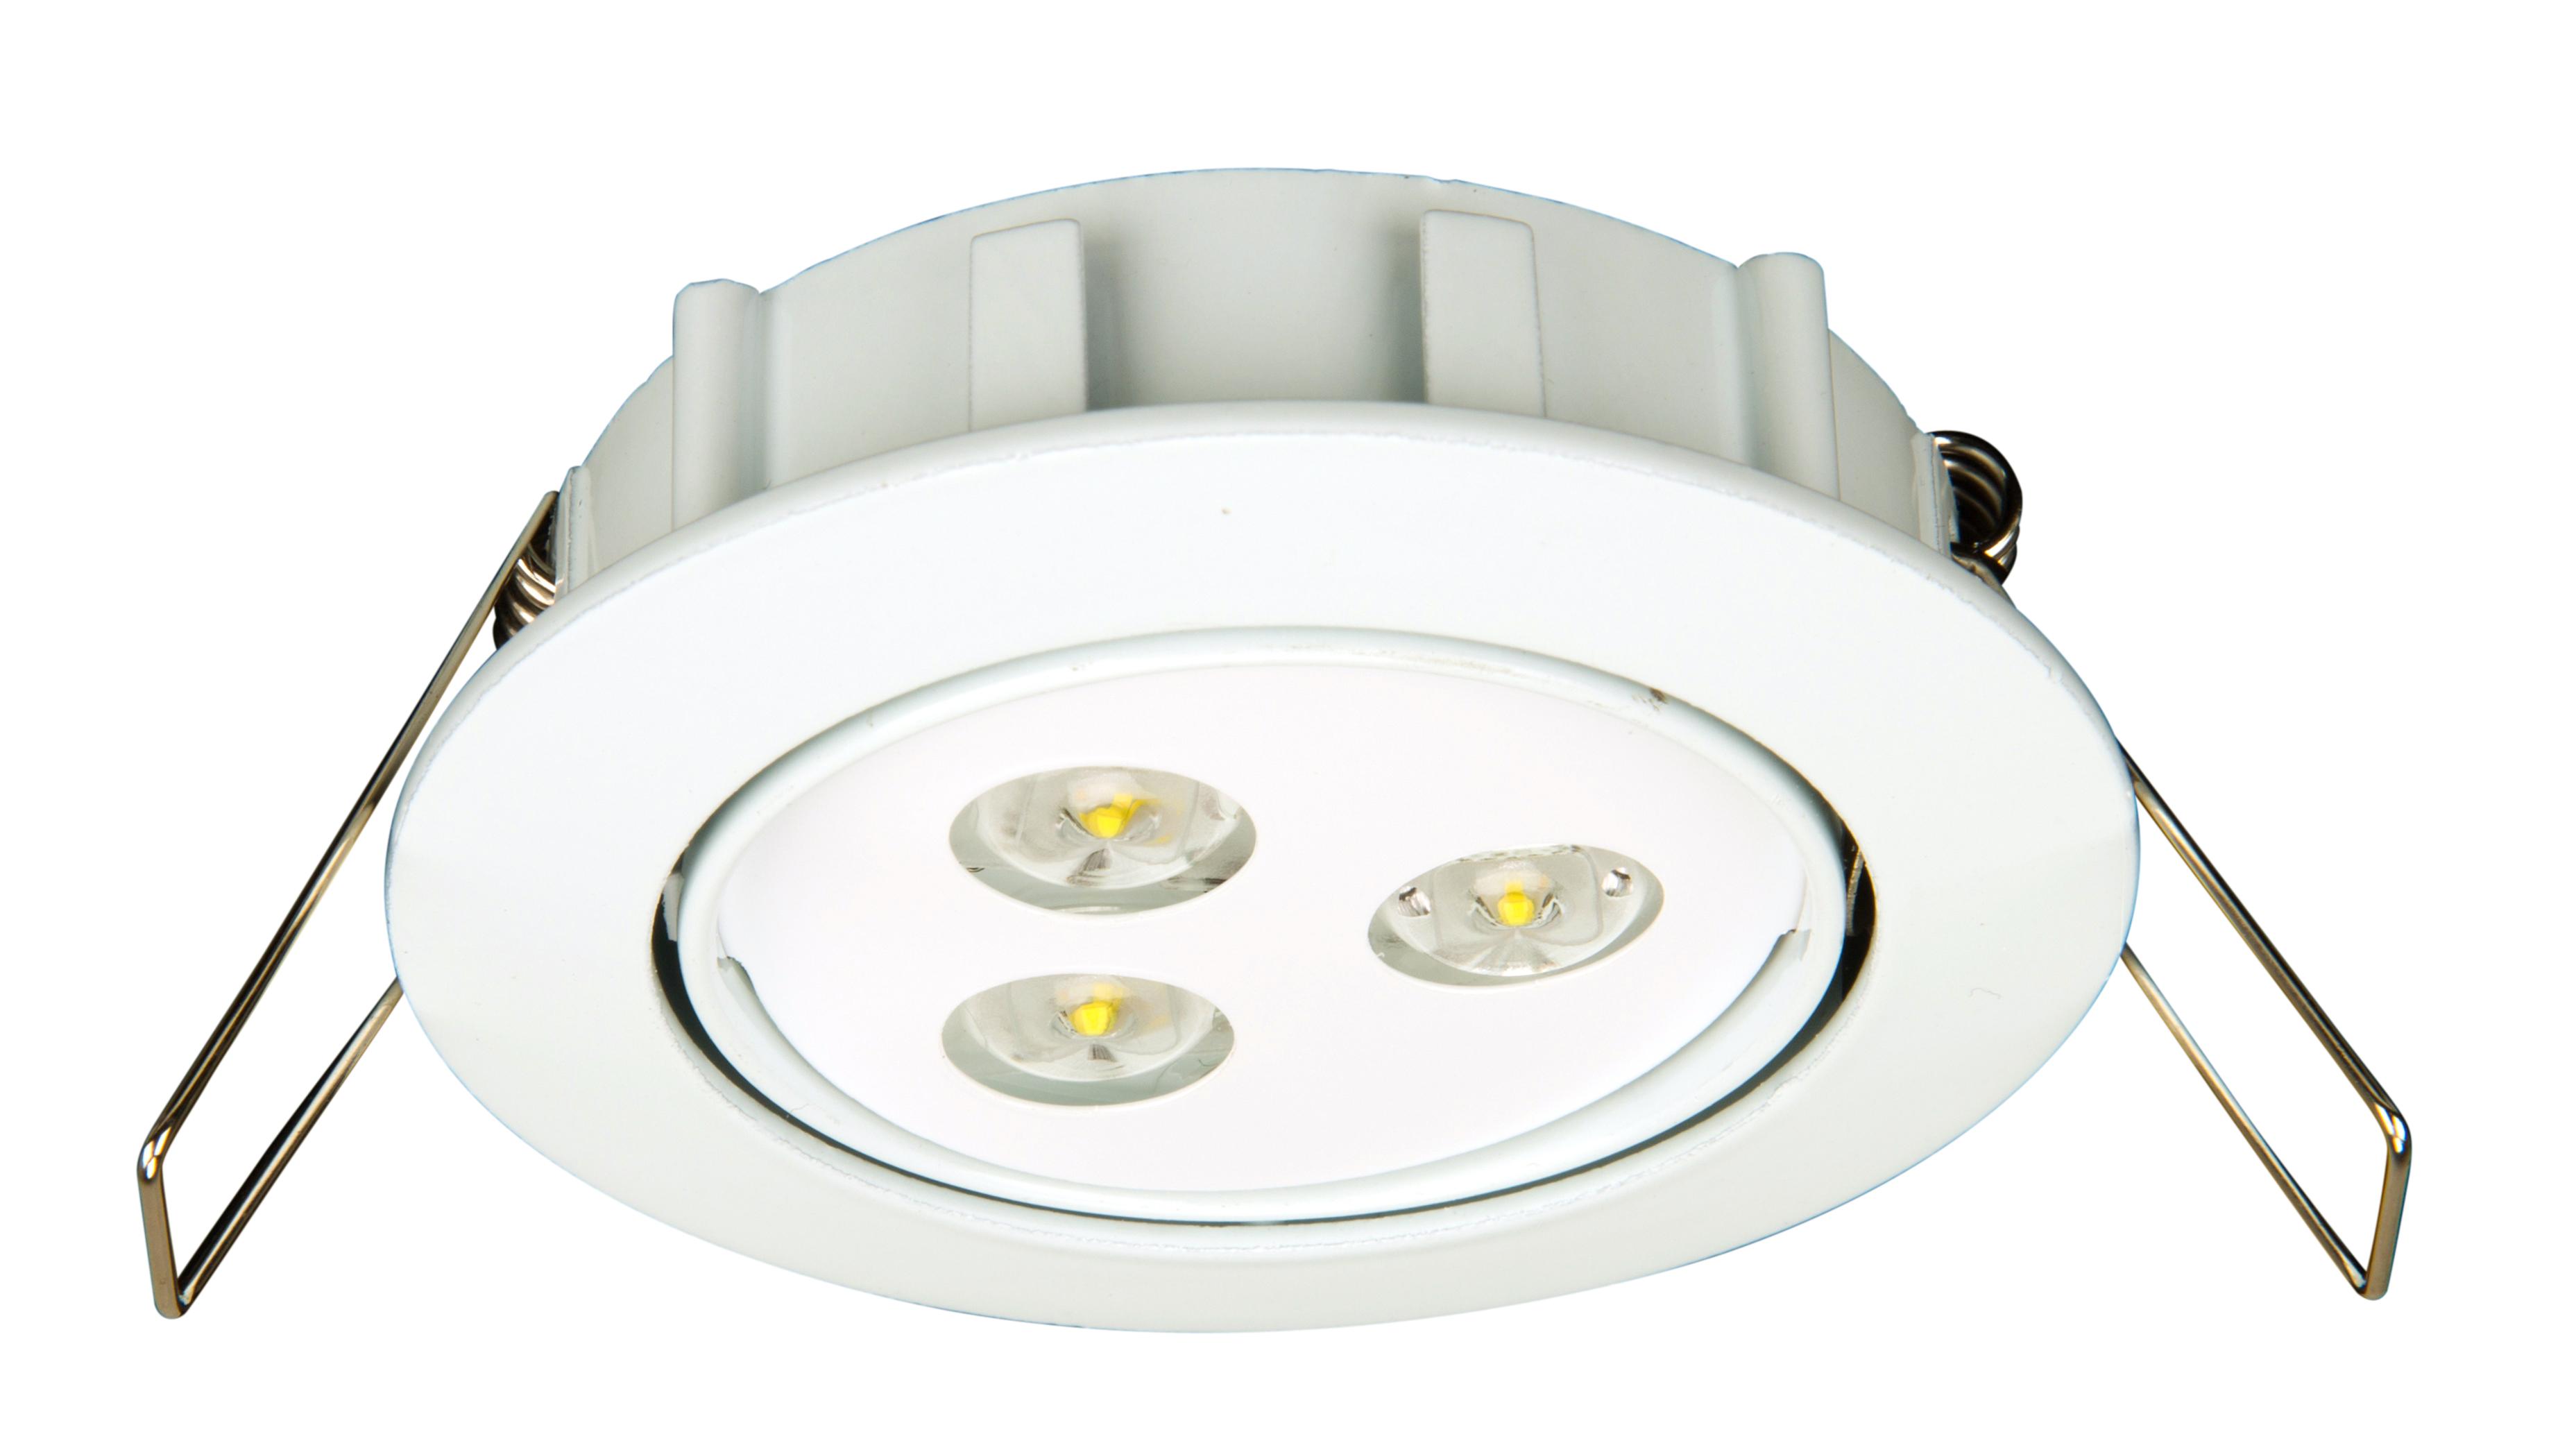 1 Stk Notleuchte DLE 3x1W ERT-LED 230V EL, Deckeneinbaumontage NLDLE029EL